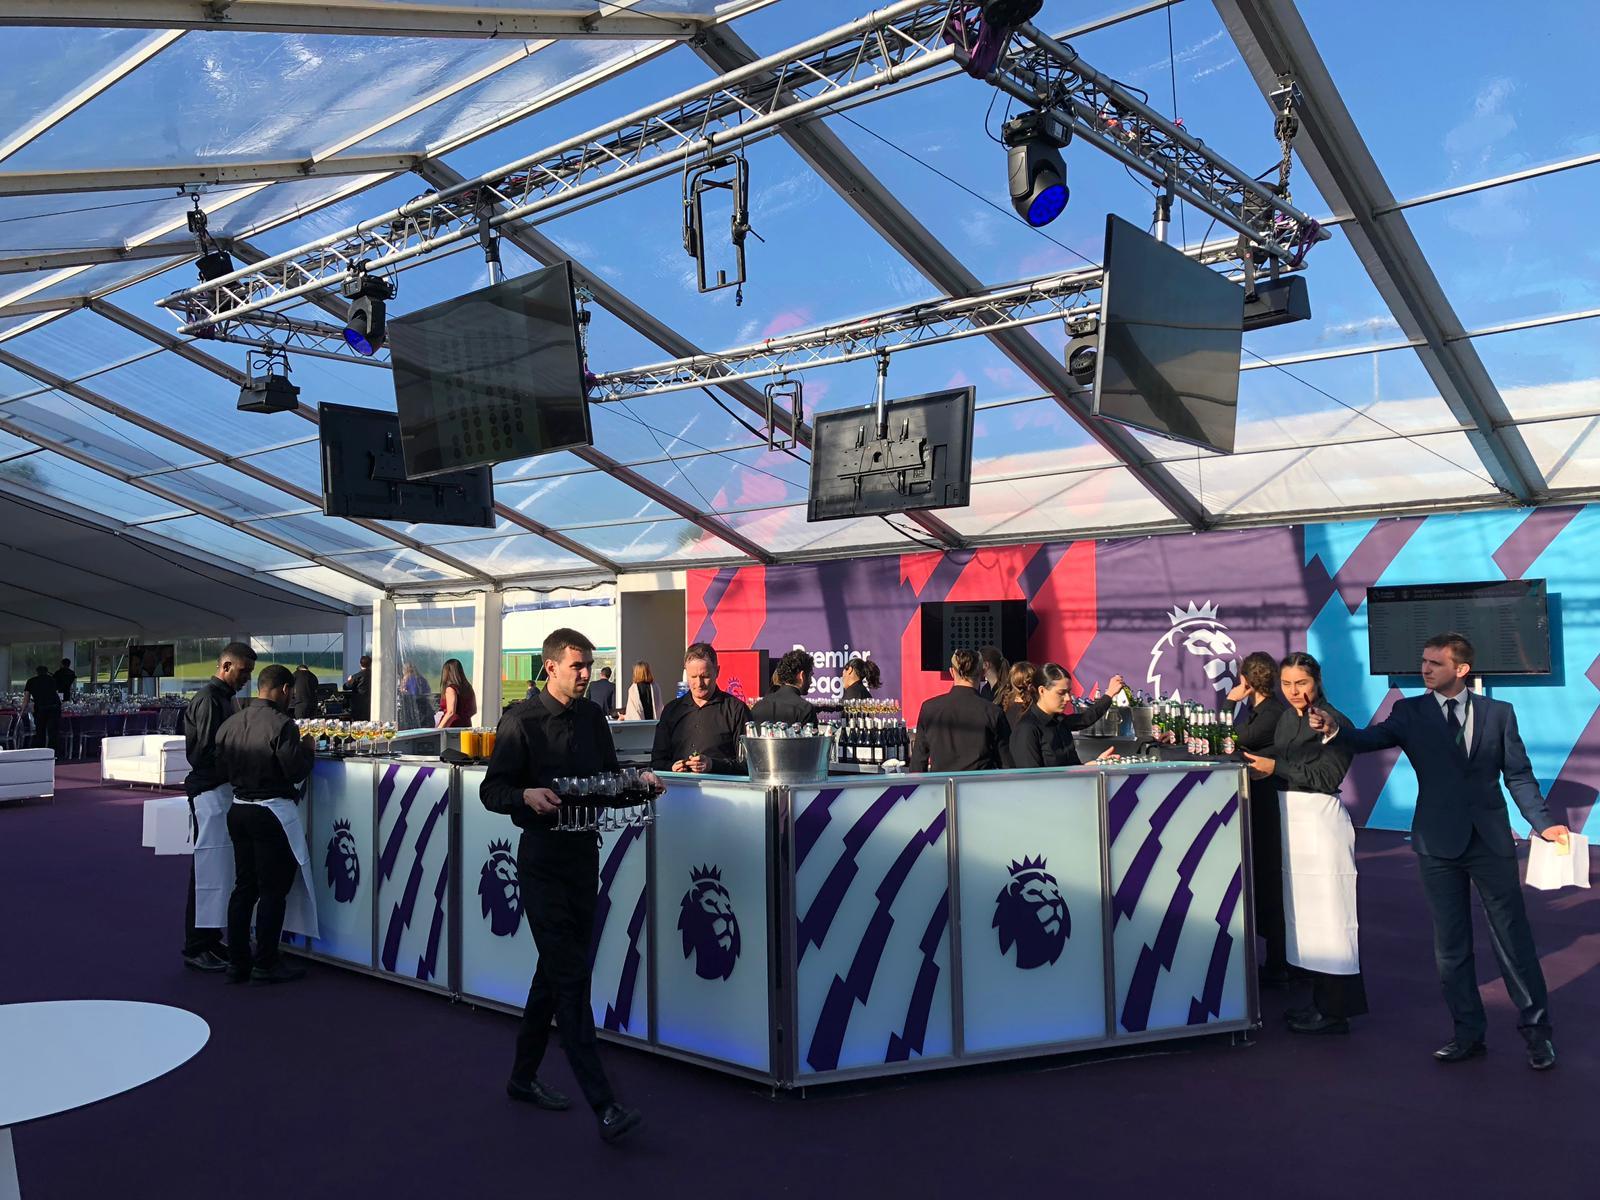 6.5m Centrepiece Contemporary LED Bar for The Premier League | Ice & Lime Mobile Bar Hire